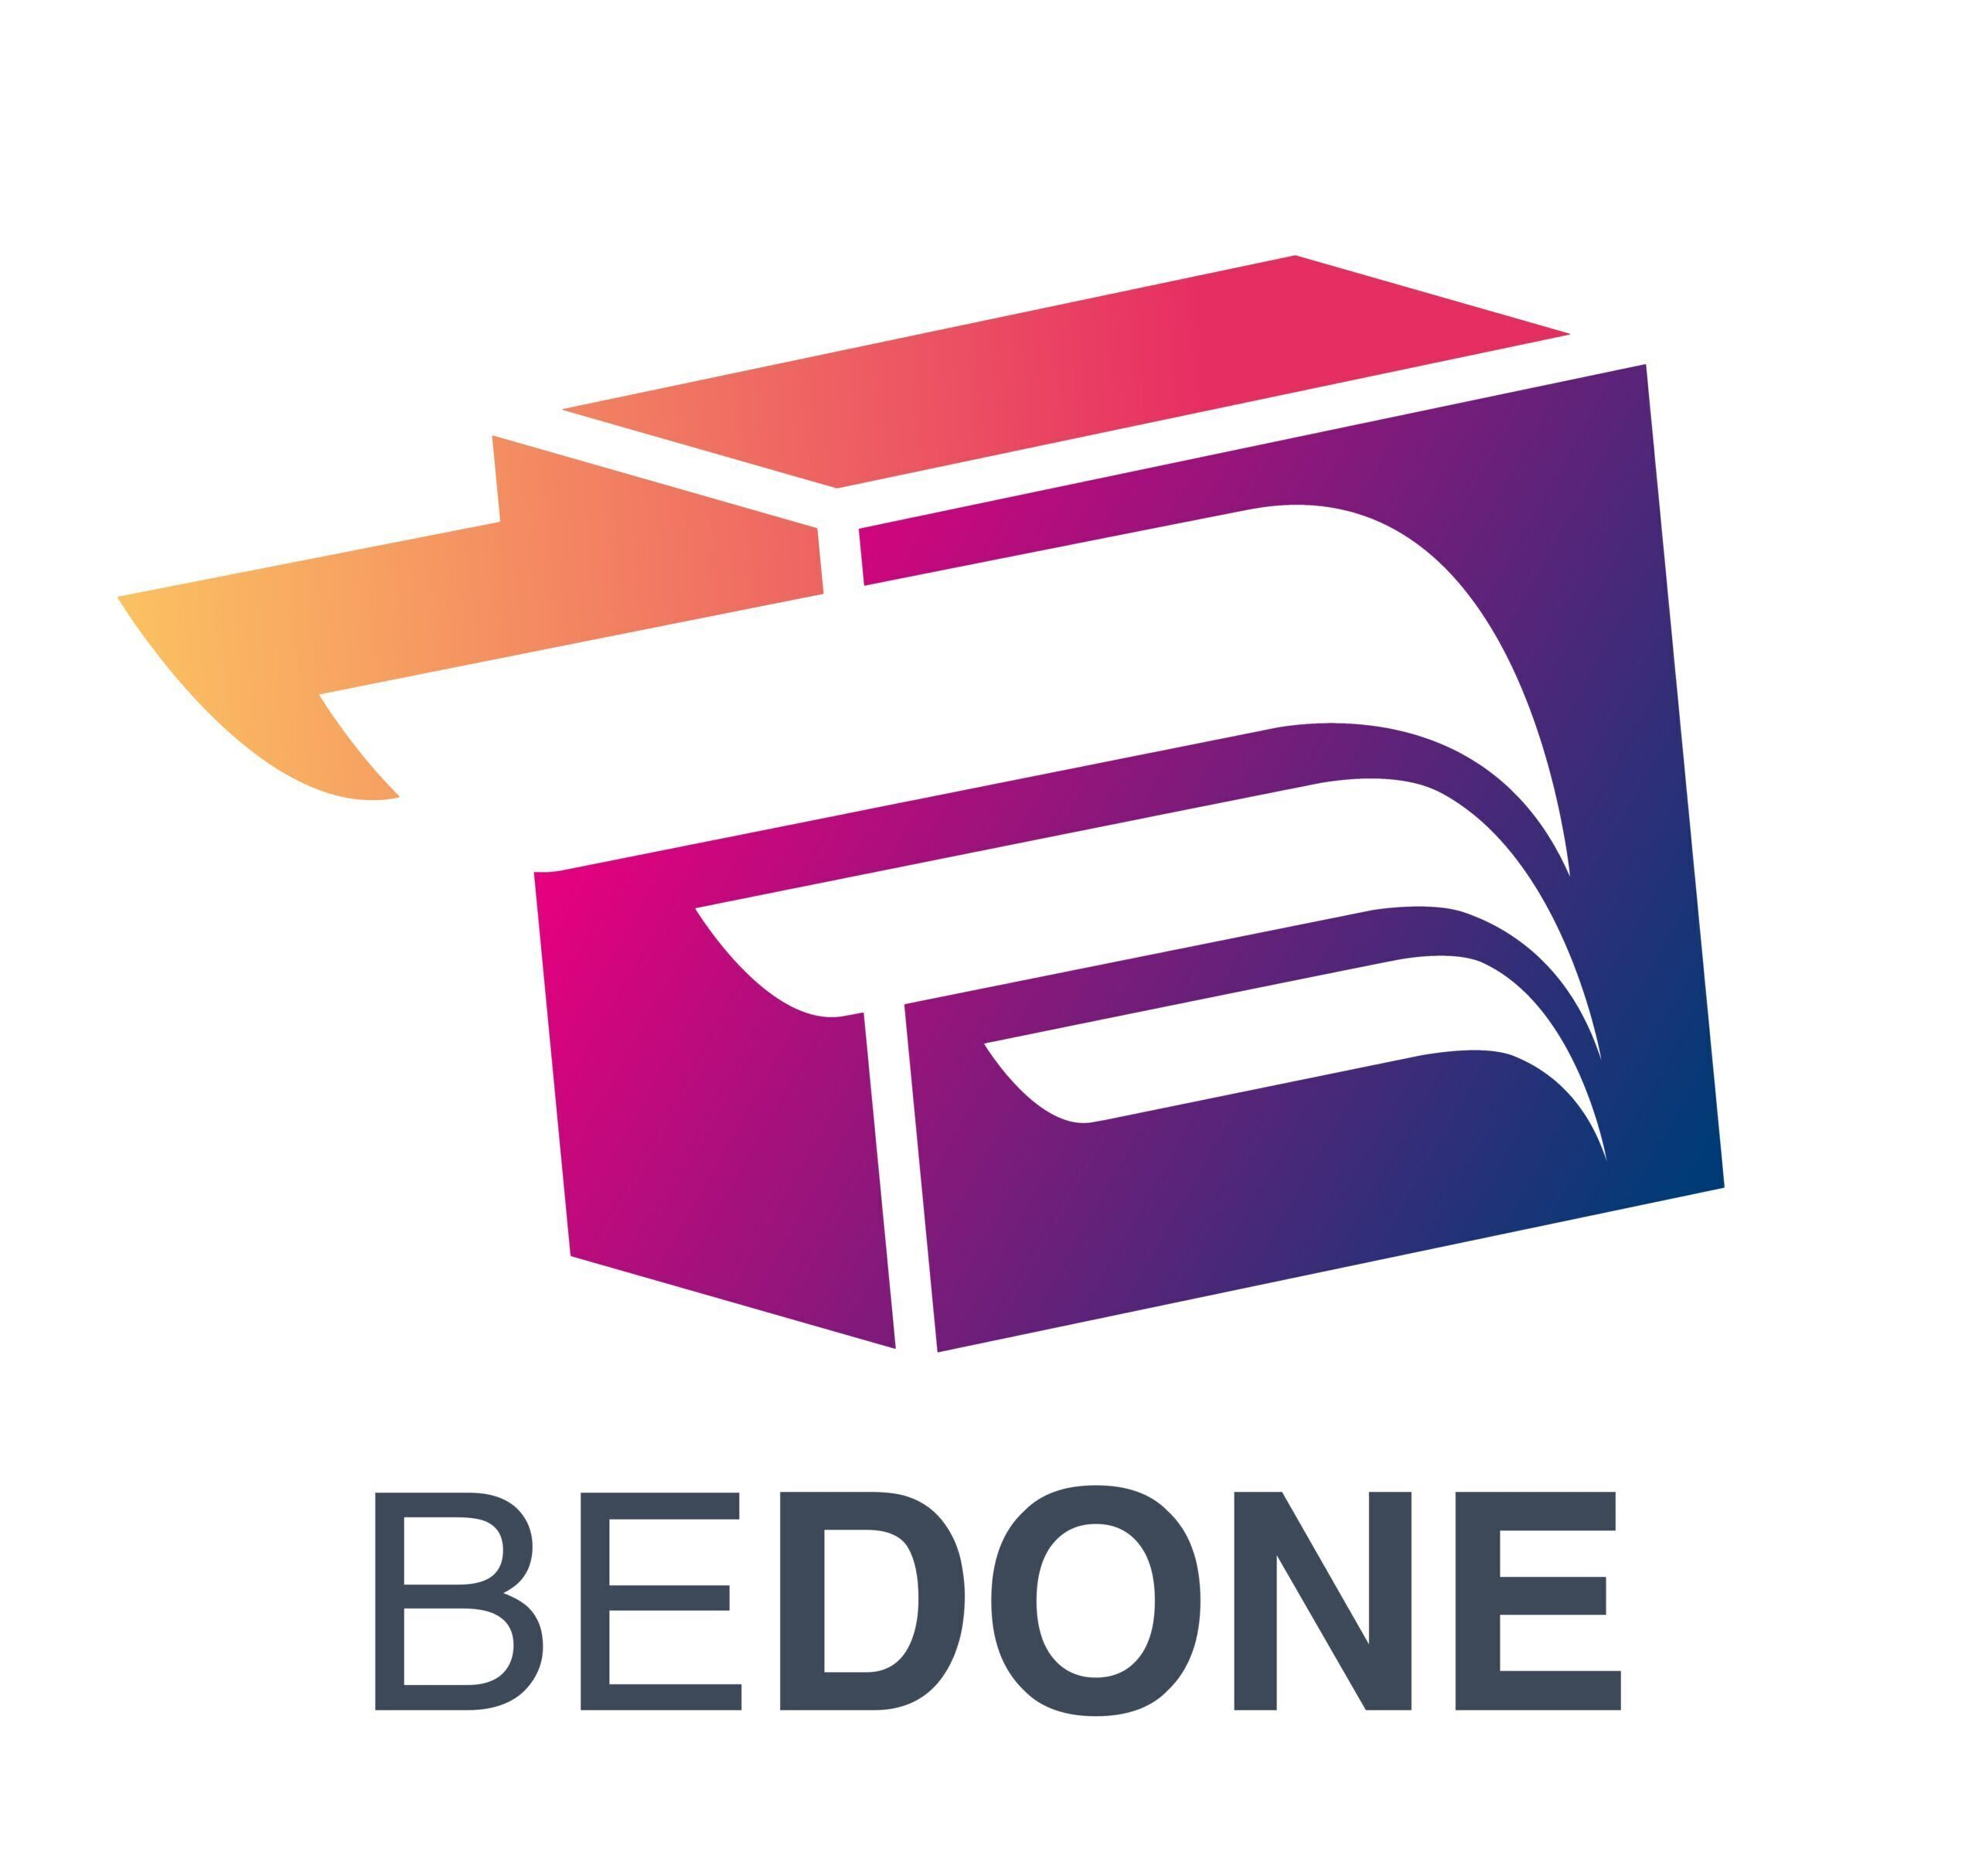 BeDone